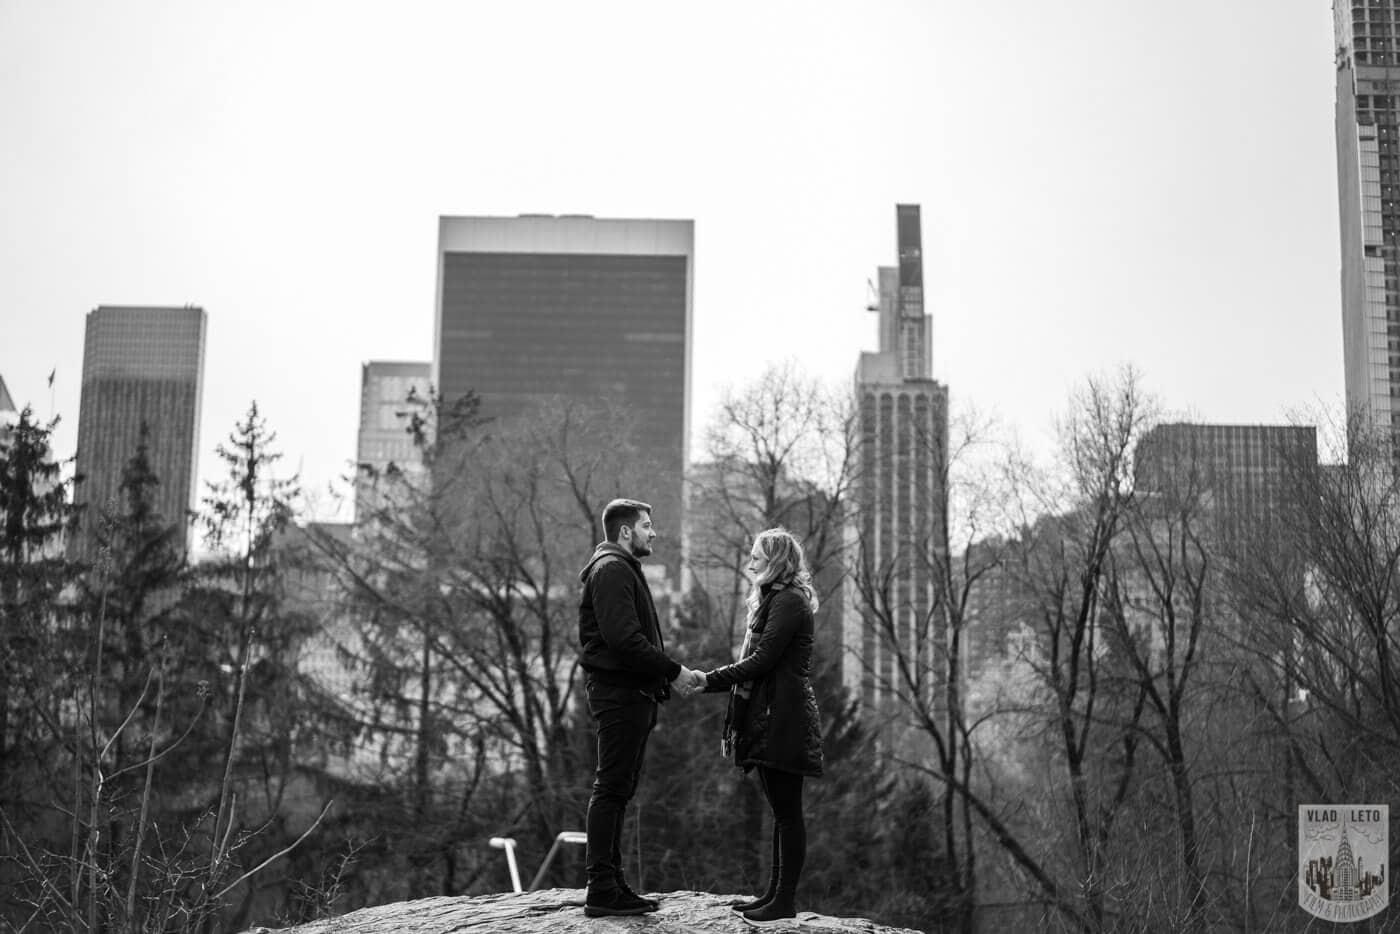 Photo 9 Bow bridge wedding proposal in Central Park | VladLeto